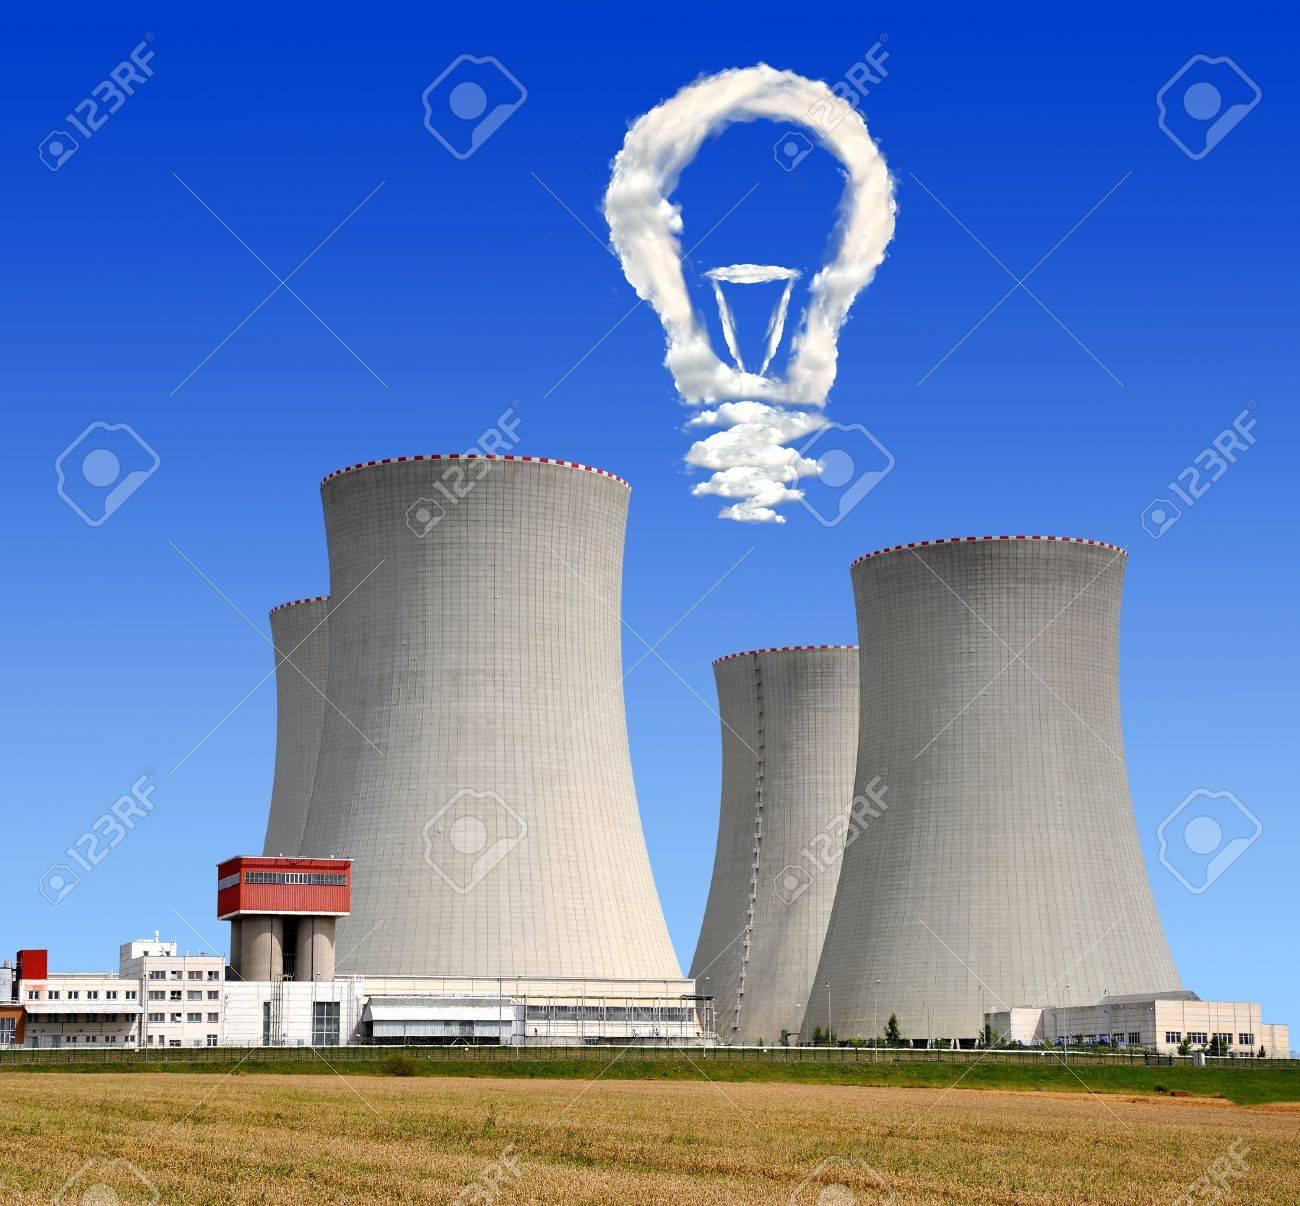 Nuclear power plant Temelin in Czech Republic Europe Stock Photo - 15735610